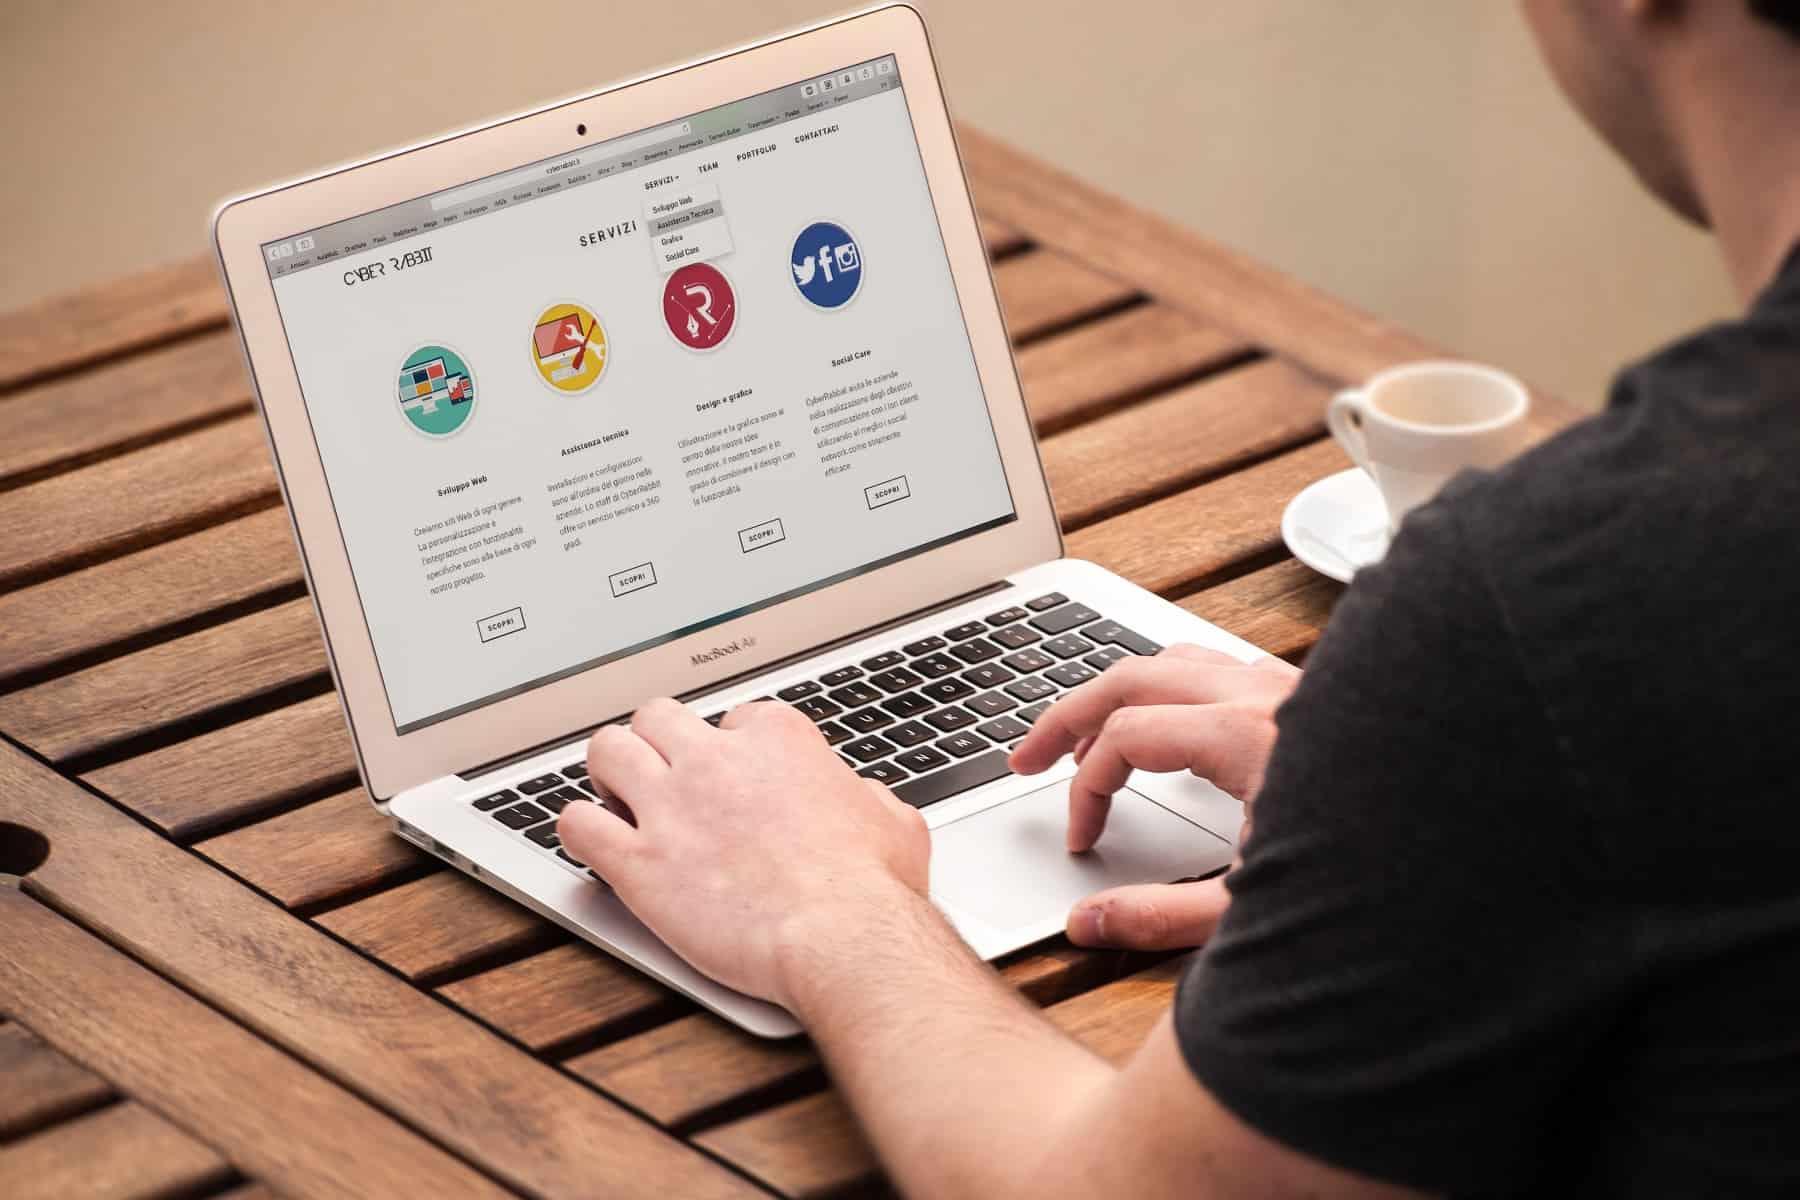 webdesign site, administrare site, campanii promovare Google Adwords, campanii promovare Facebook Ads. realizare magazin online,management retele sociale, florentina iliescu, cum sa faci seo, administrare bloguri, optimizare seo